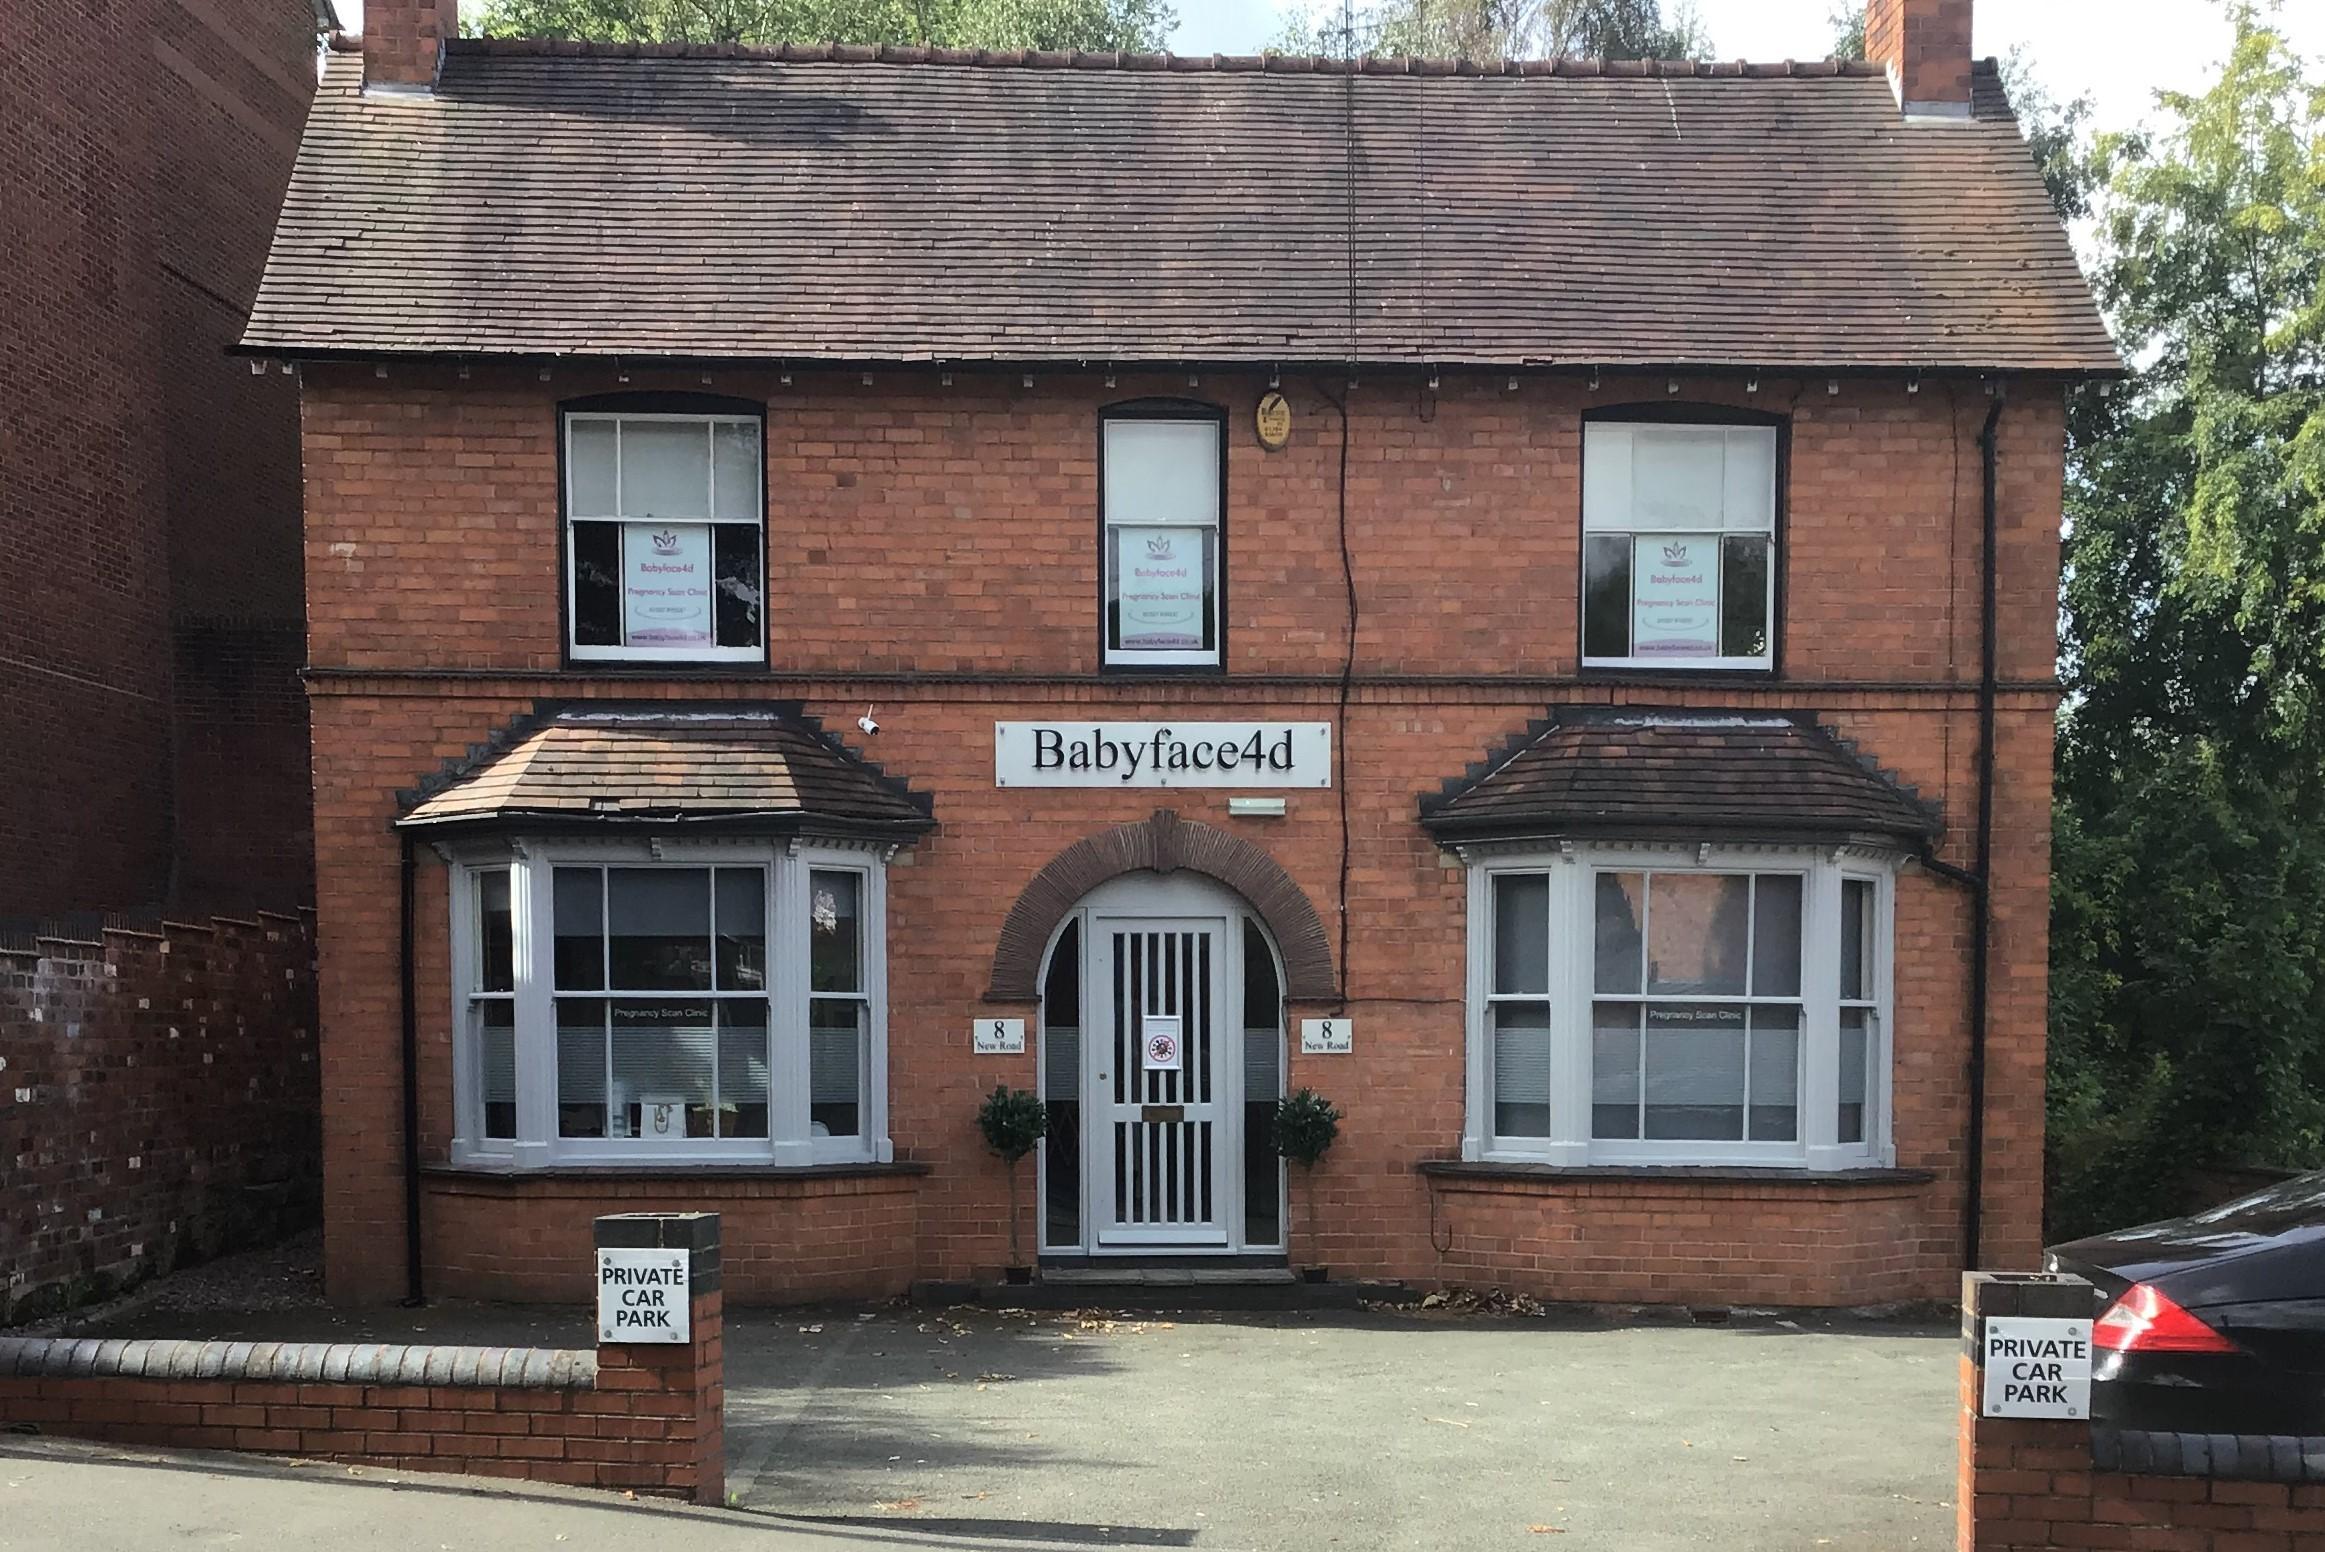 Babyface4D Pregnancy scan clinic - New Road, Bromsgrove